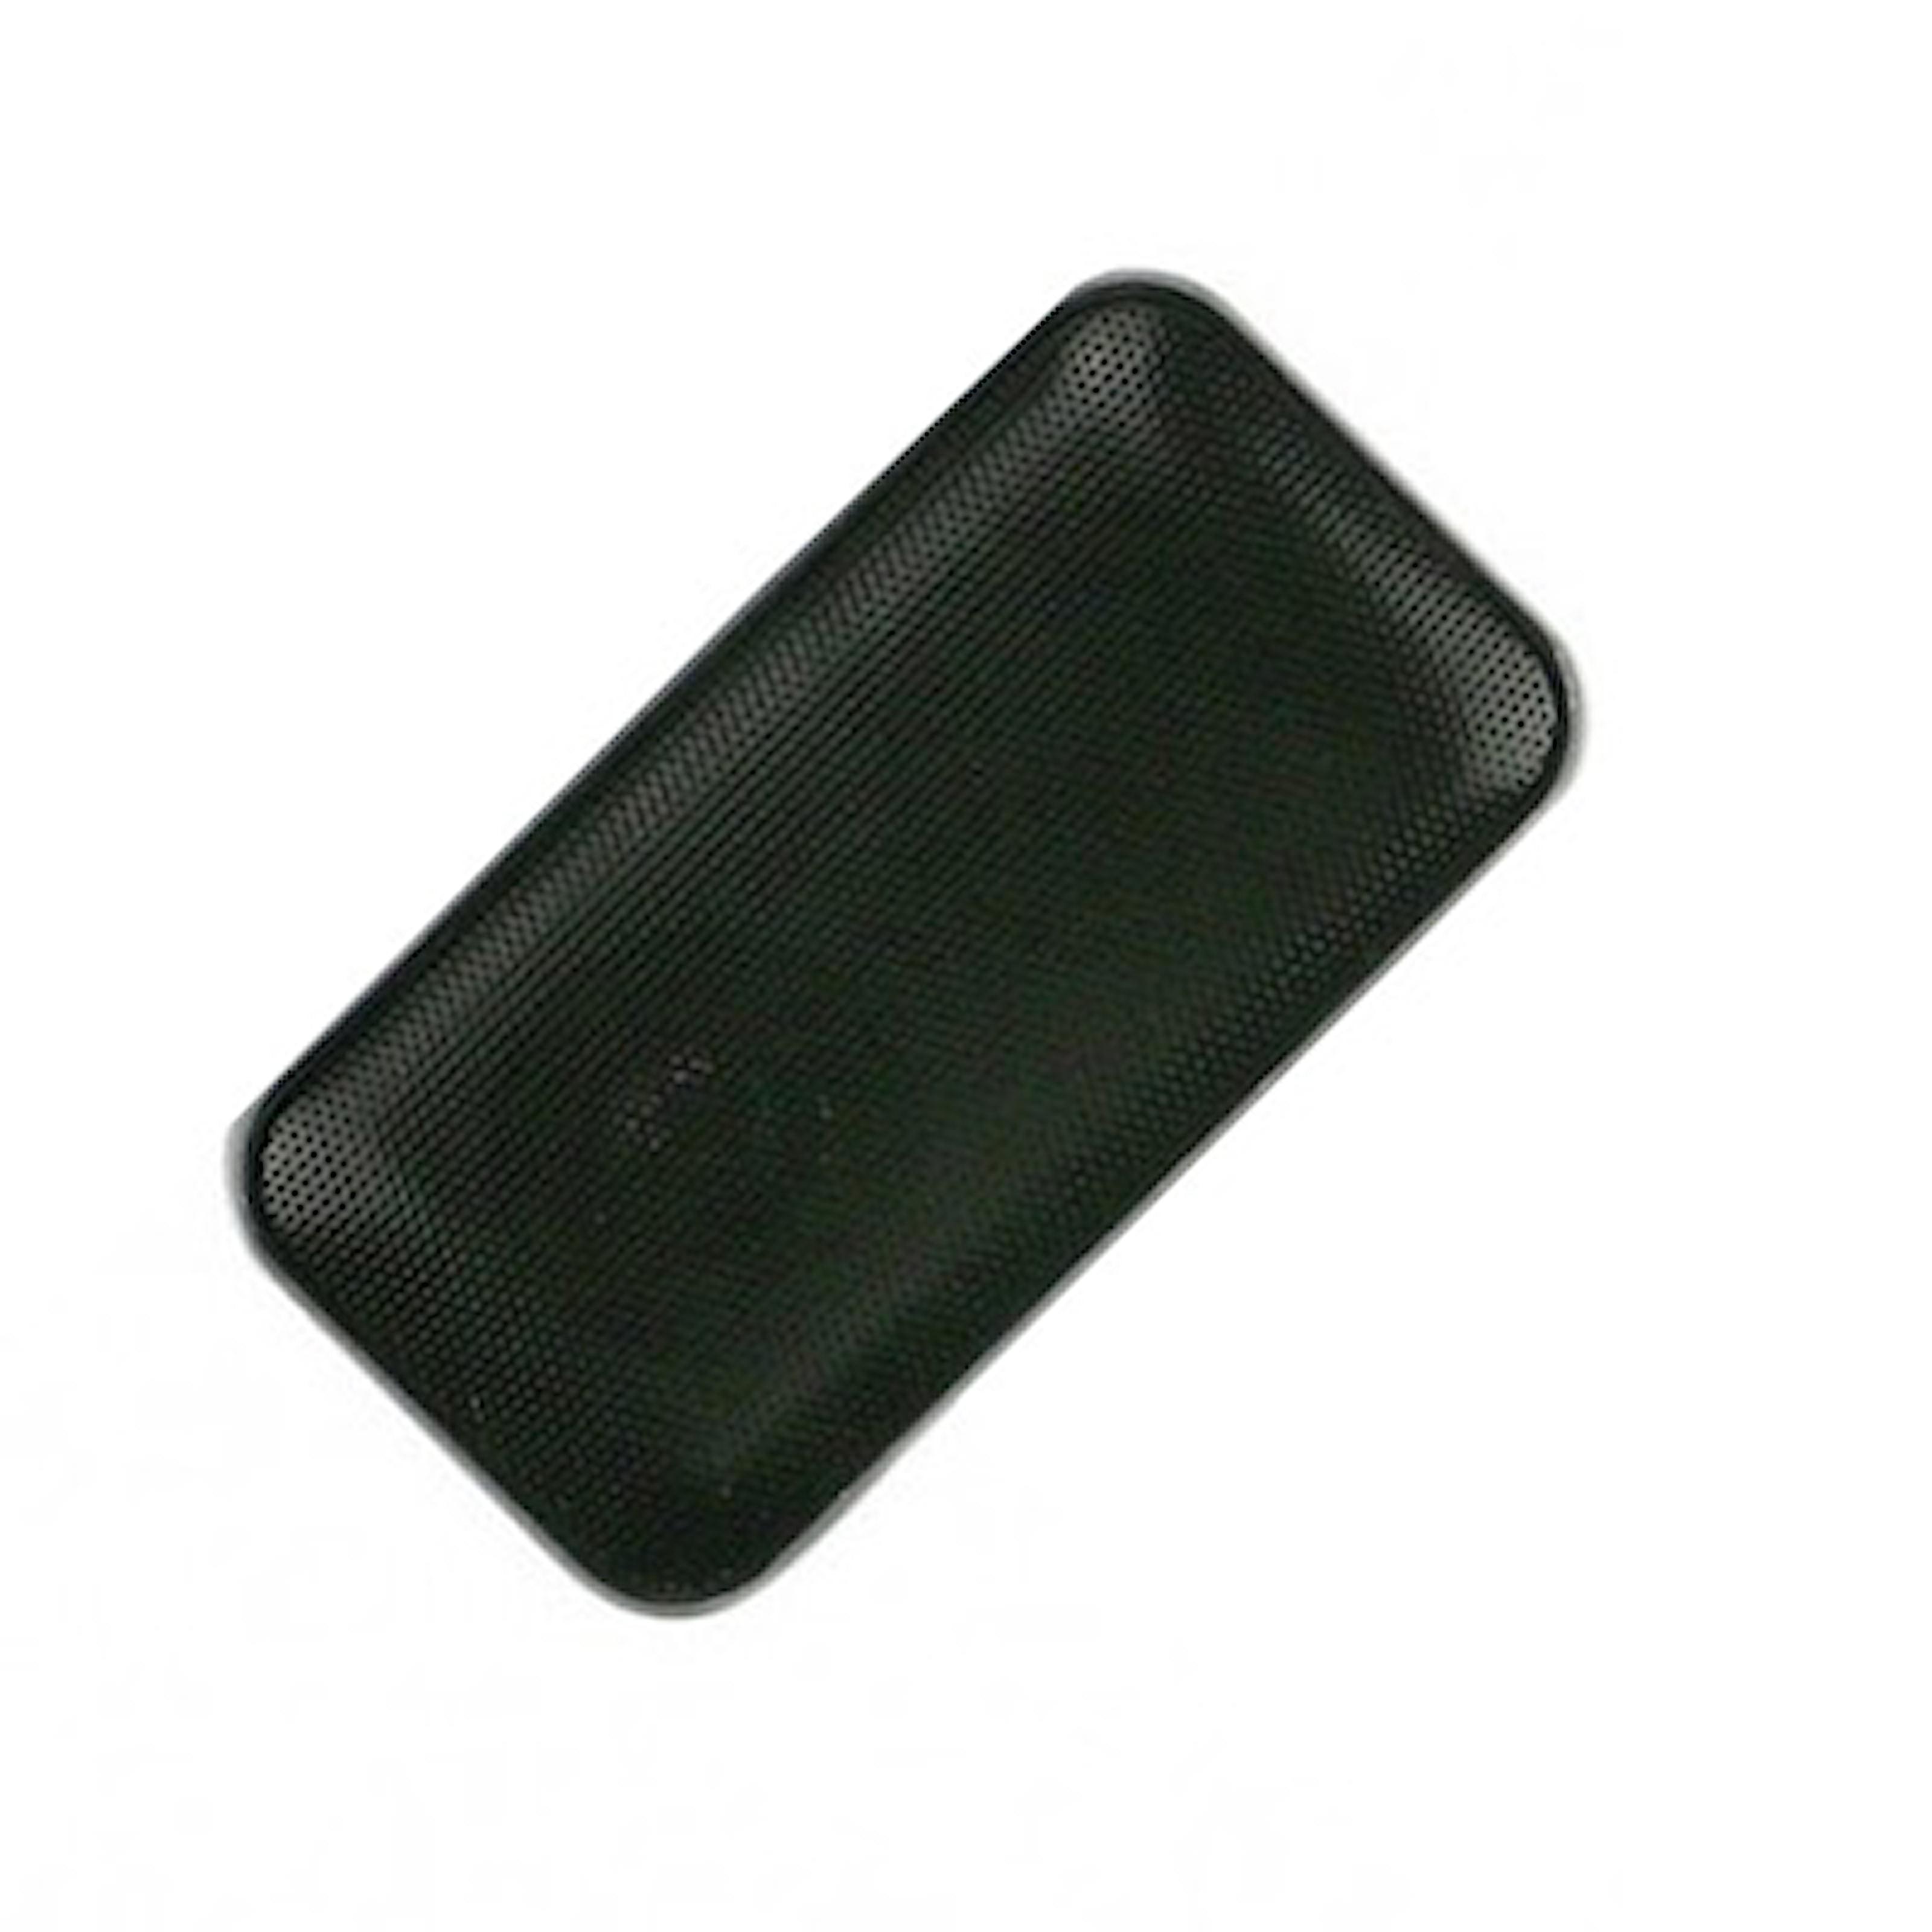 Svart, BT207 Pocket Wireless BT Speaker, Bærbar minihøytaler, ,